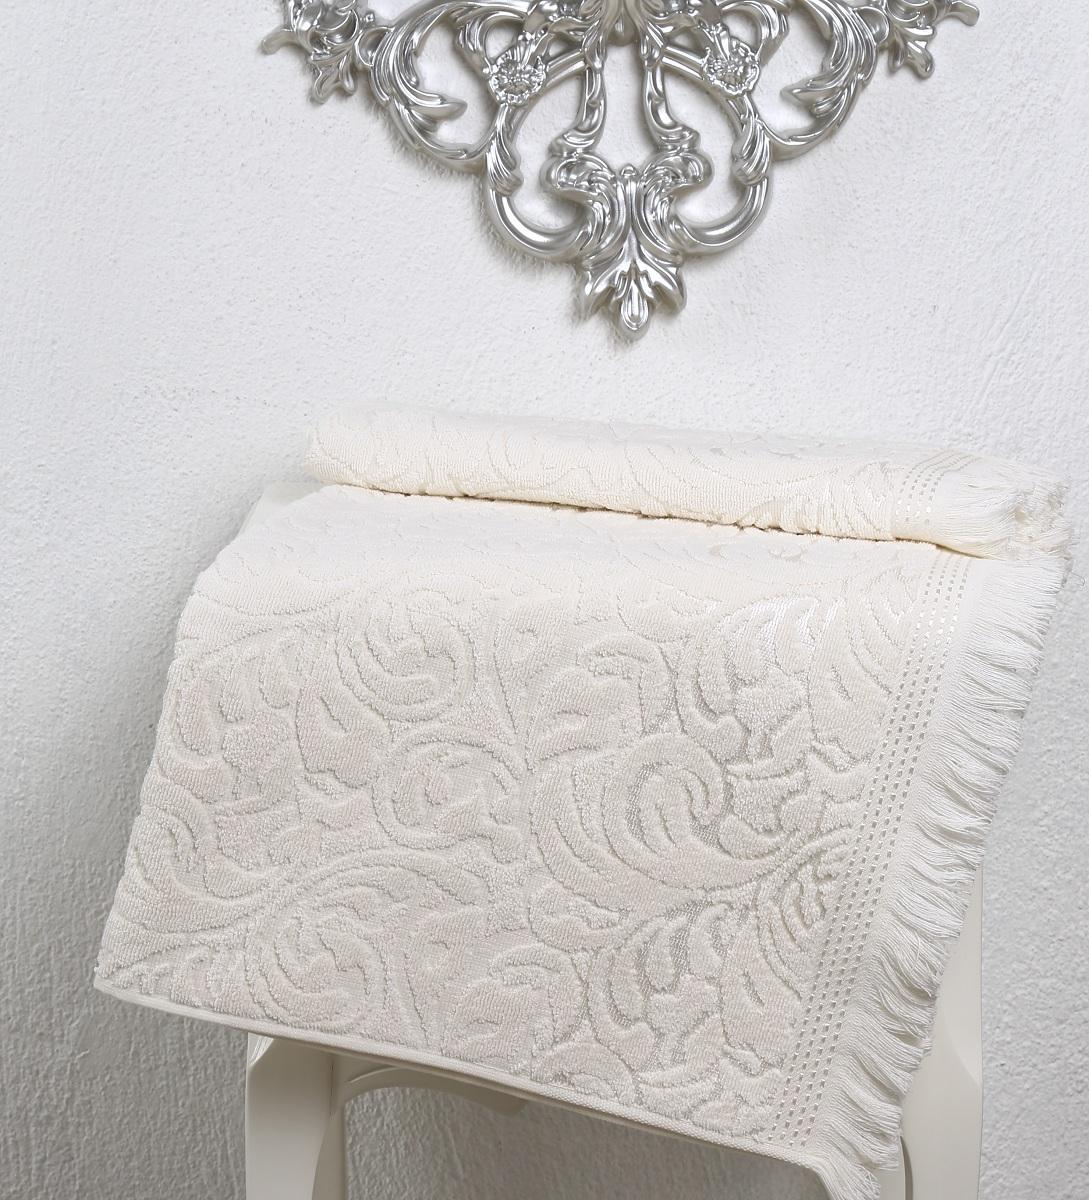 Полотенце Karna Esra, цвет: кремовый, 70 х 140 см полотенца valentini полотенце aqua цвет кремовый набор